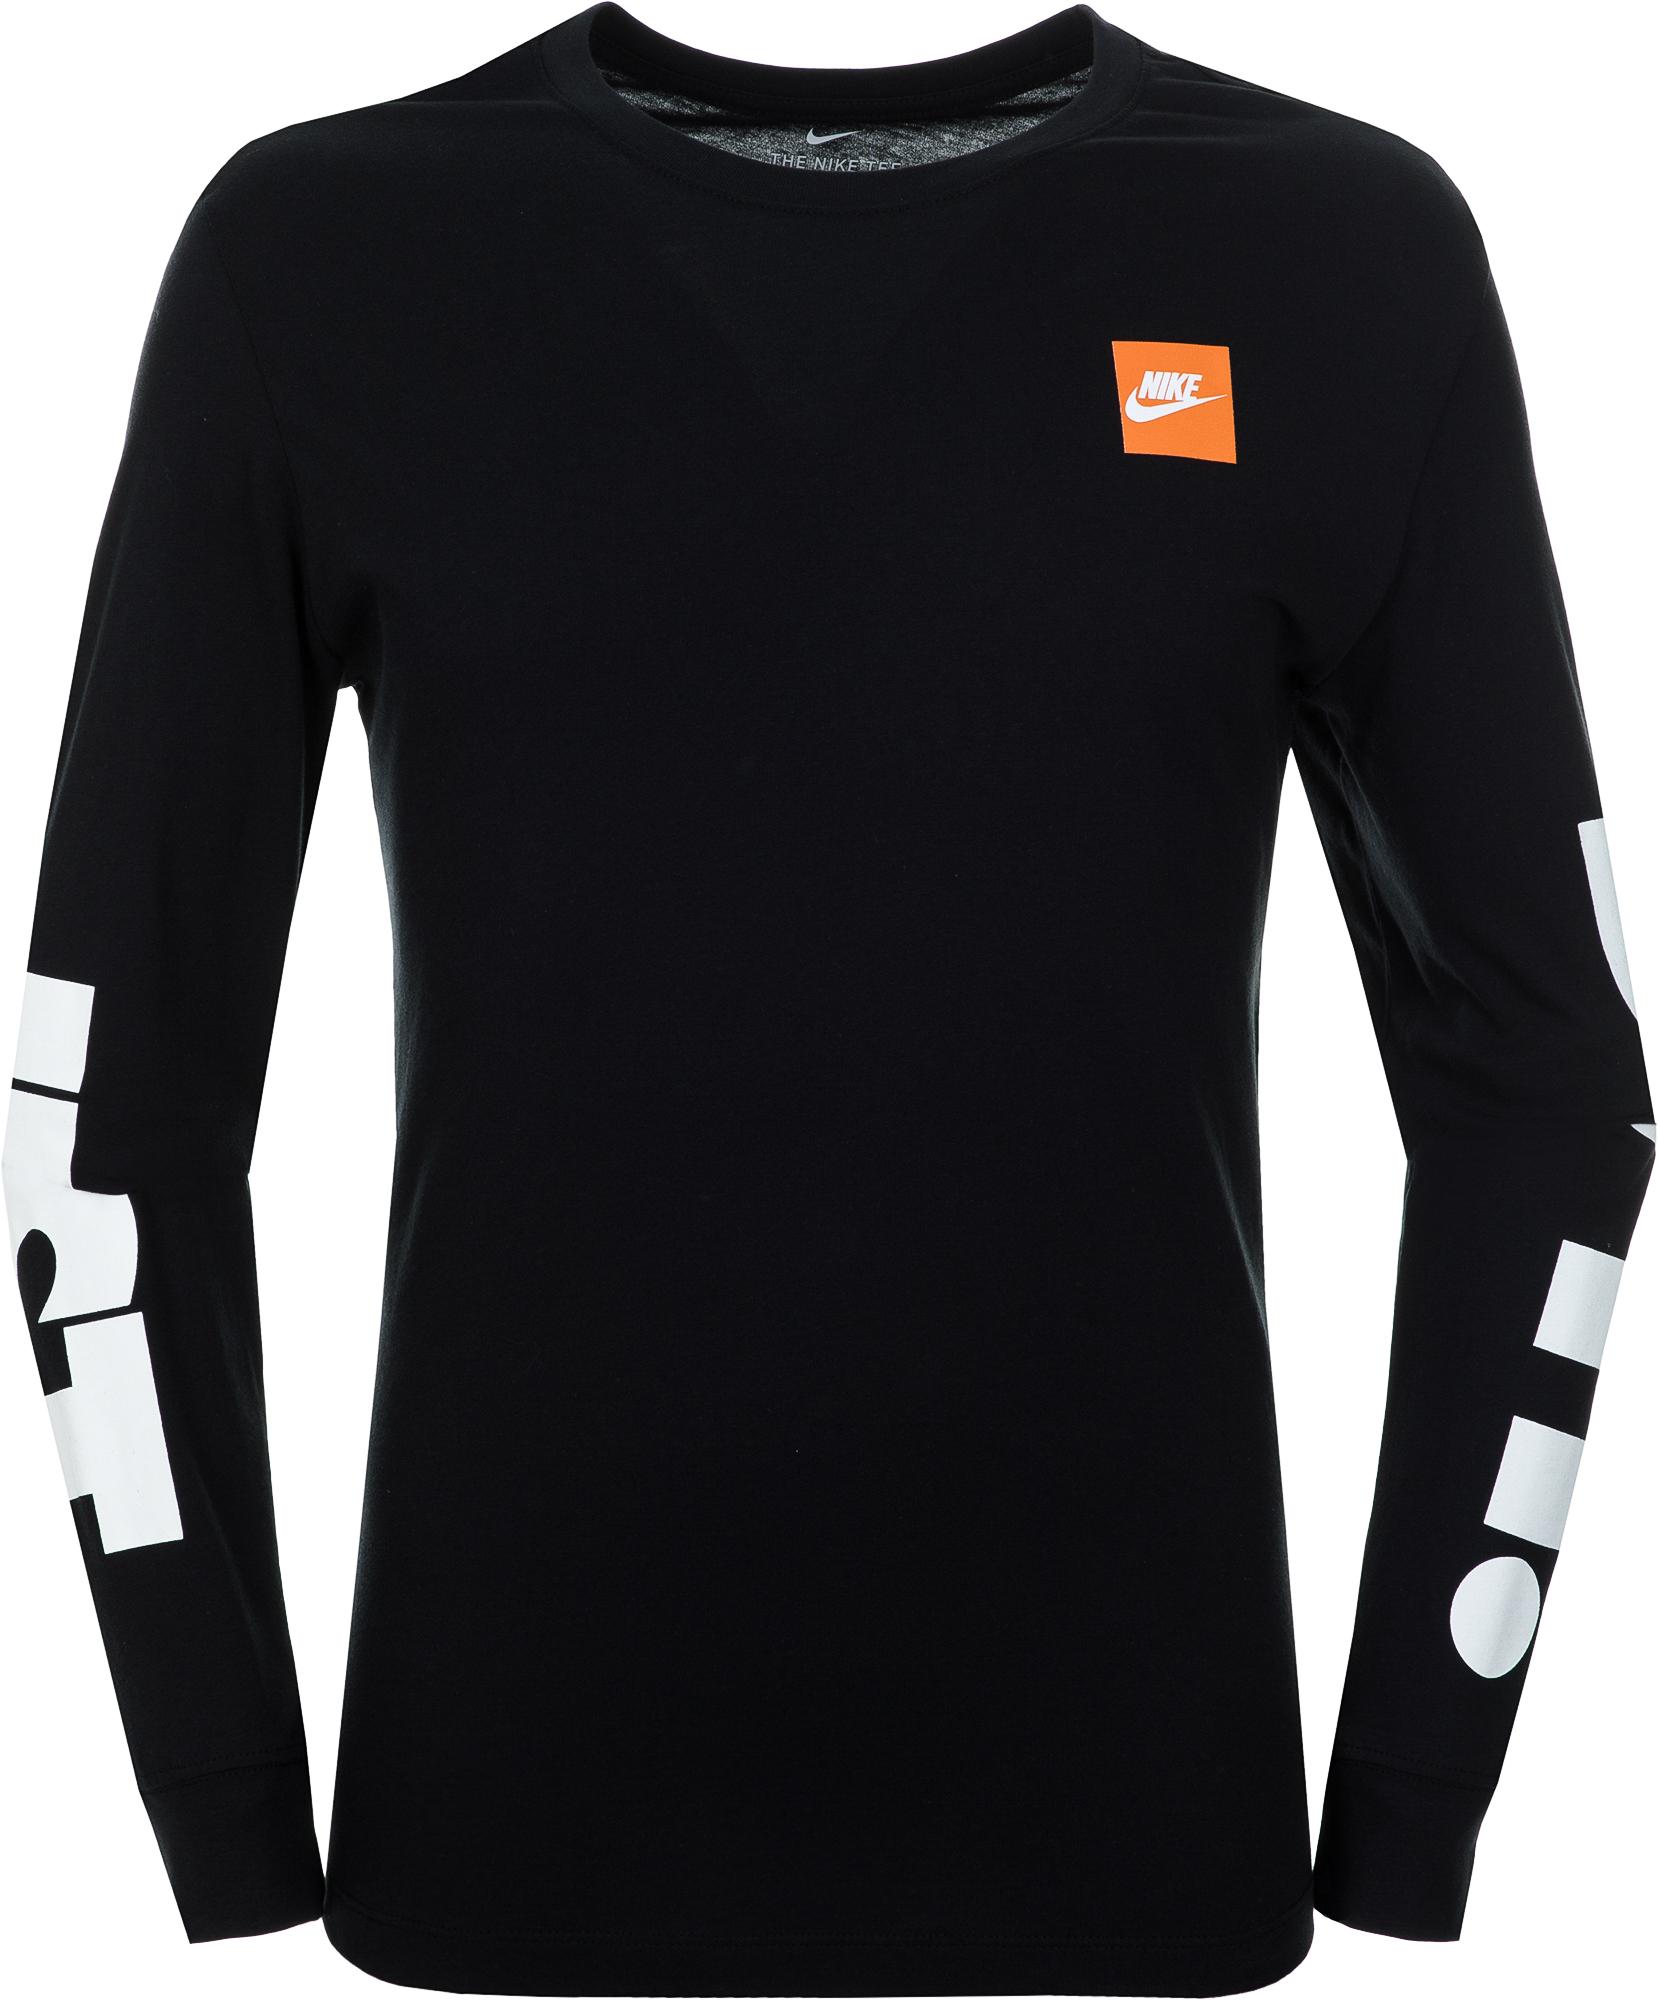 Nike Футболка с длинным рукавом мужская Nike Sportswear, размер 52-54